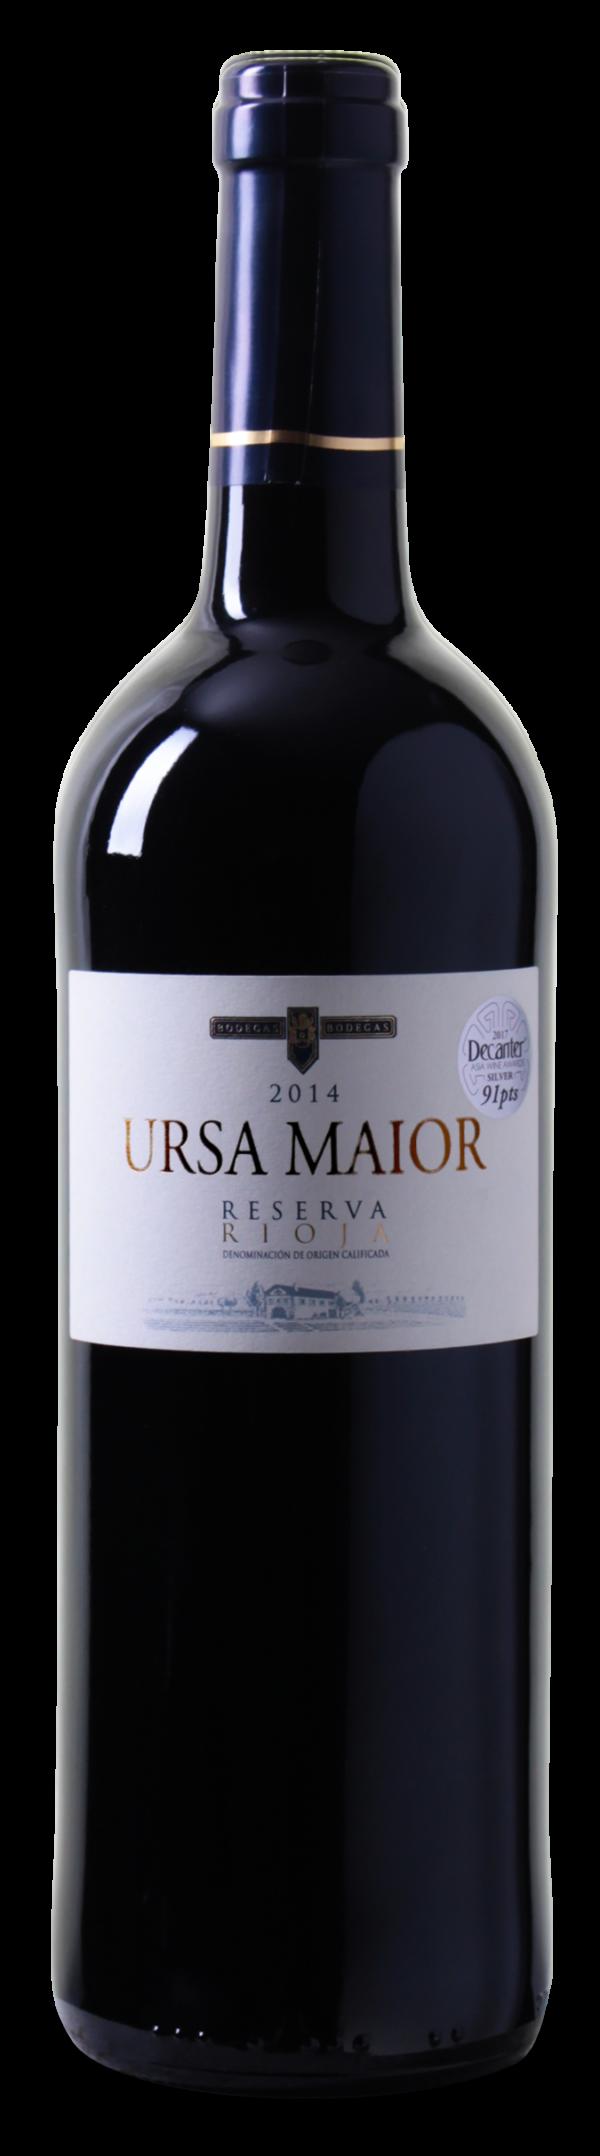 91 Decanter Punkte: Ursa Maior – Reserva – Rioja DOCa 2014 nur 5,99 € statt 11,99 €